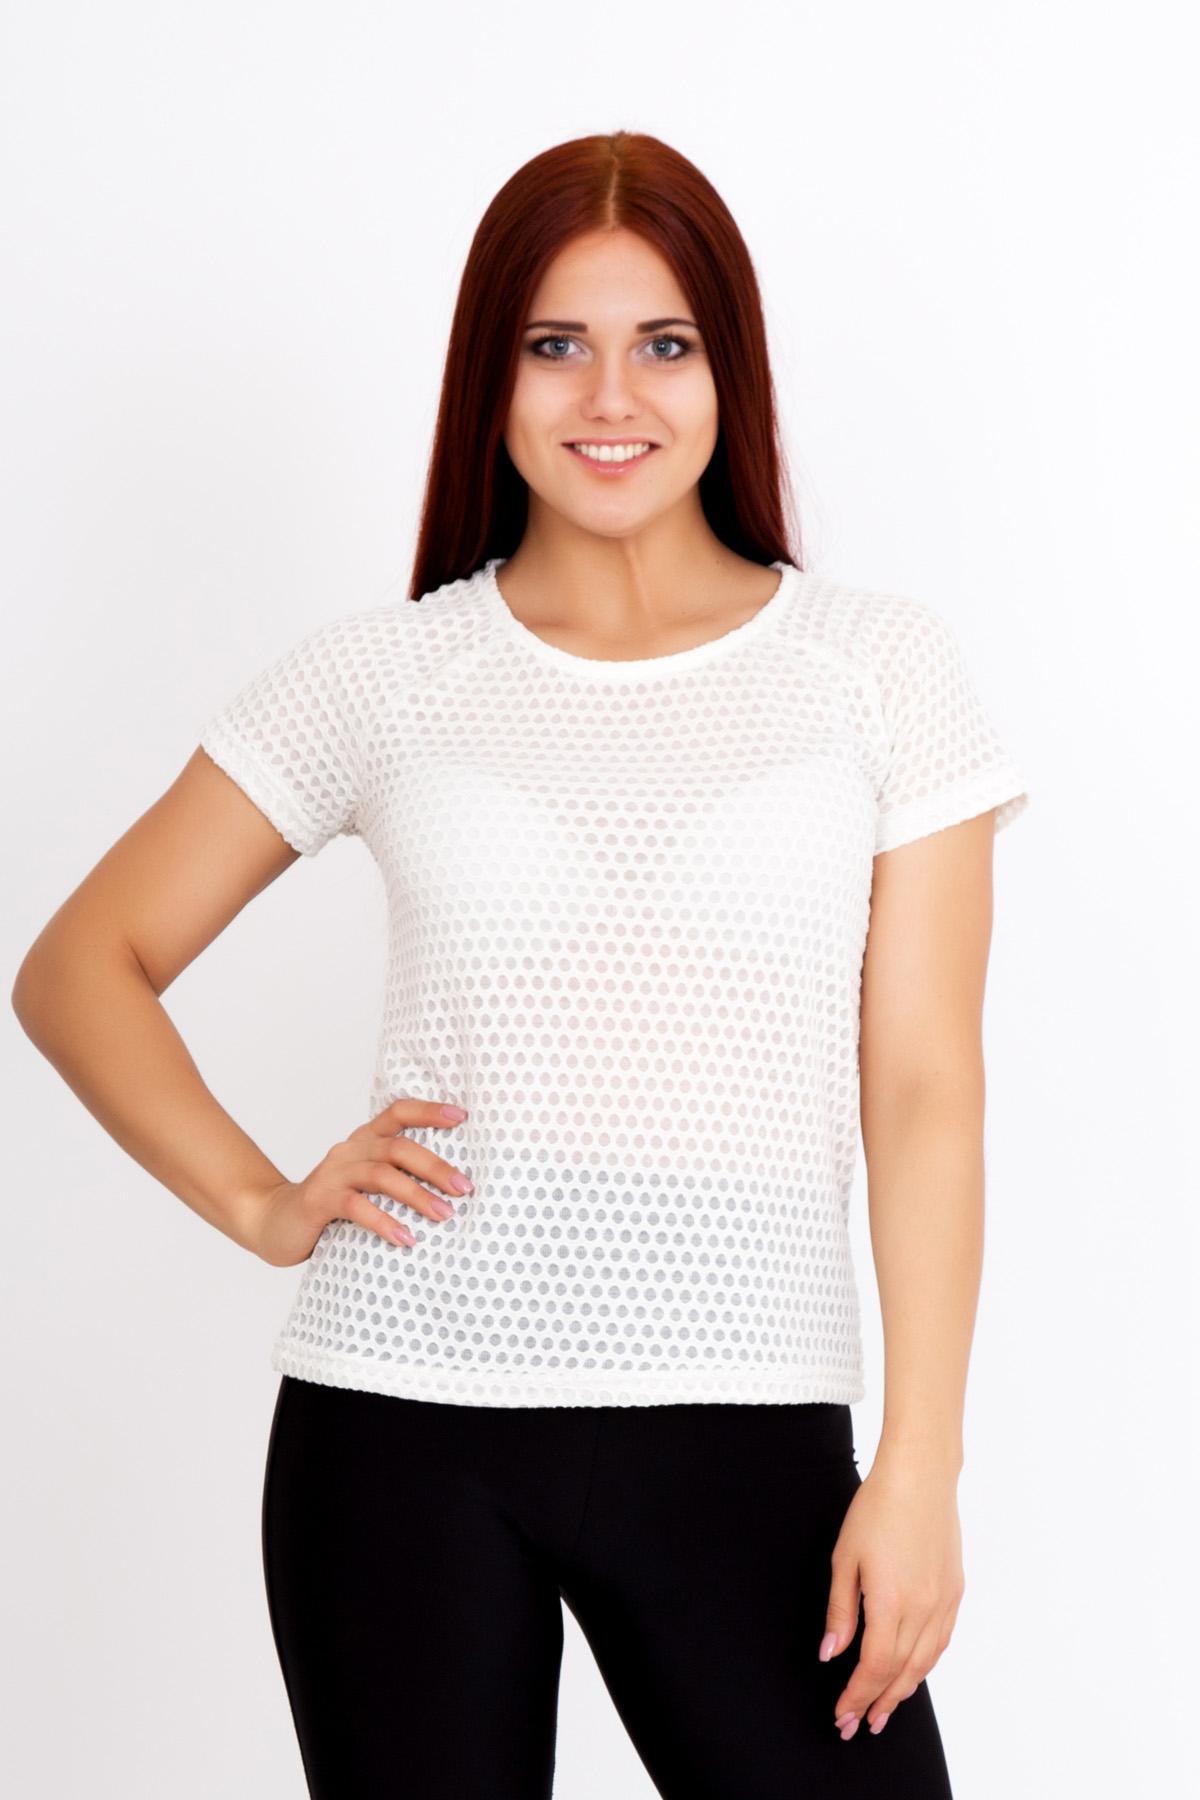 Жен. блуза Ажур Белый р. 44Блузы<br>Обхват груди: 88 см <br>Обхват талии: 68 см <br>Обхват бедер: 96 см <br>Длина по спинке: 55 см <br>Рост: 167 см<br><br>Тип: Жен. блуза<br>Размер: 44<br>Материал: Вискоза